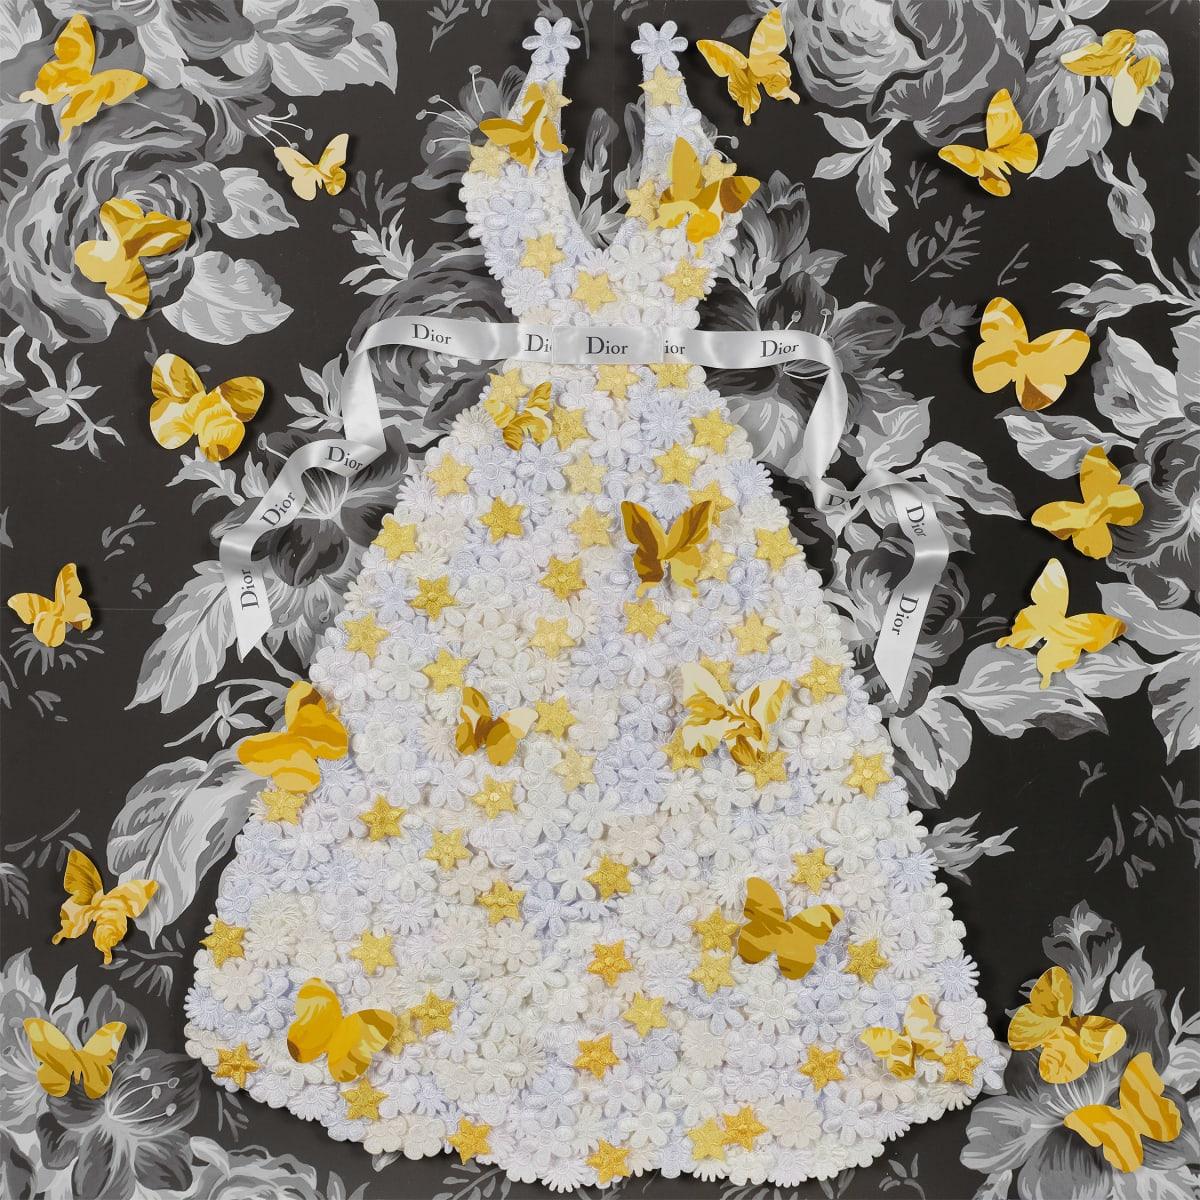 Stephen Wilson, Princess Dior, Yellow , 2019